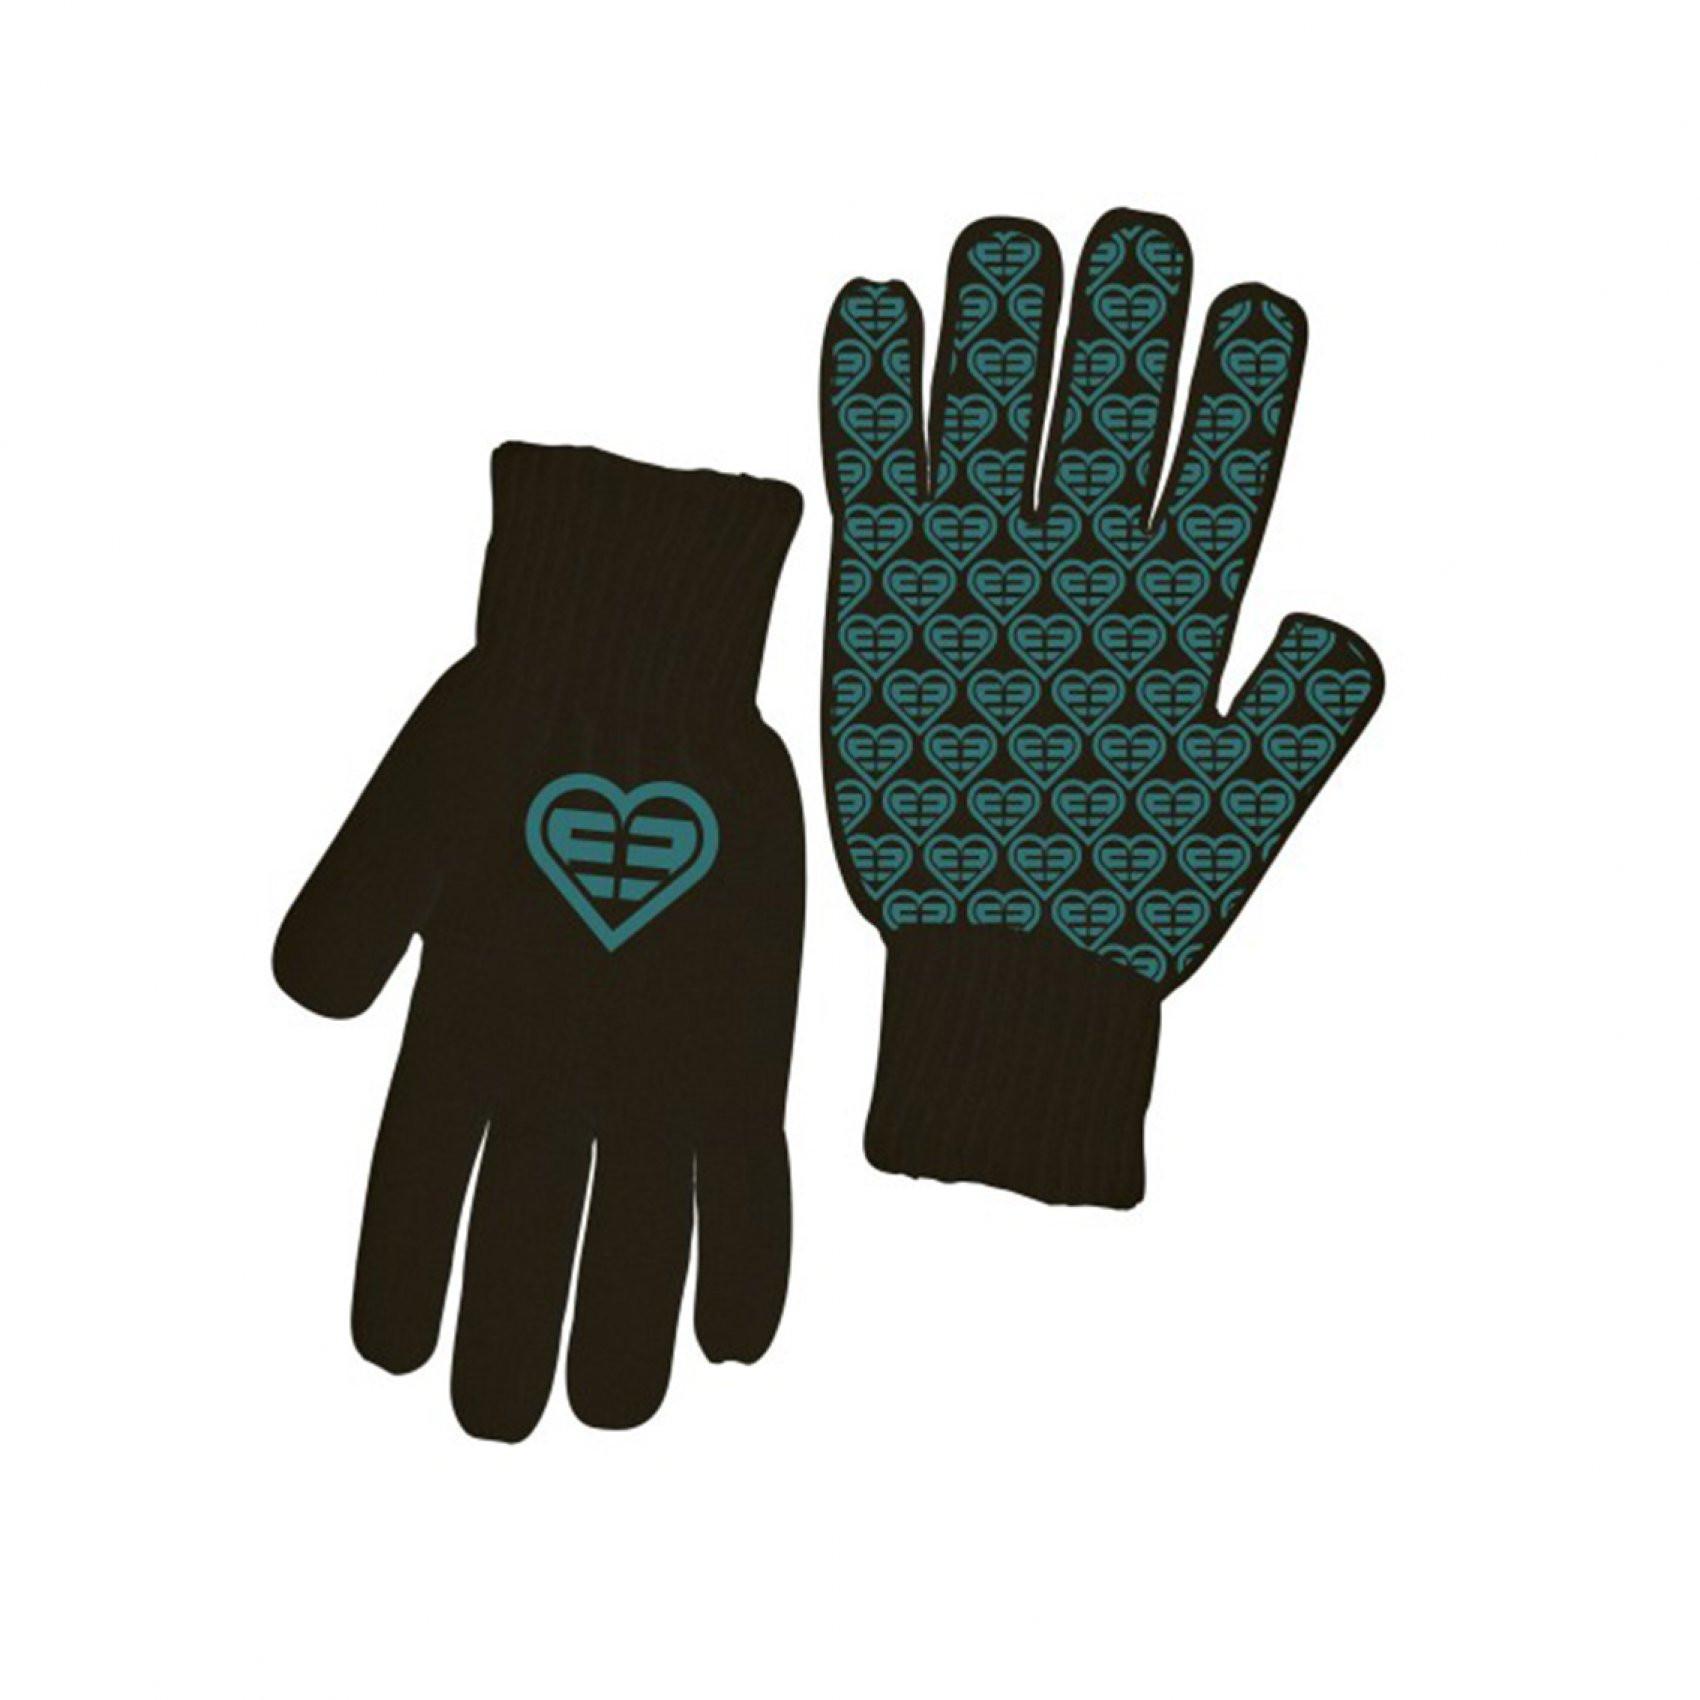 Paire de gants fille logo bleu freegun (photo)